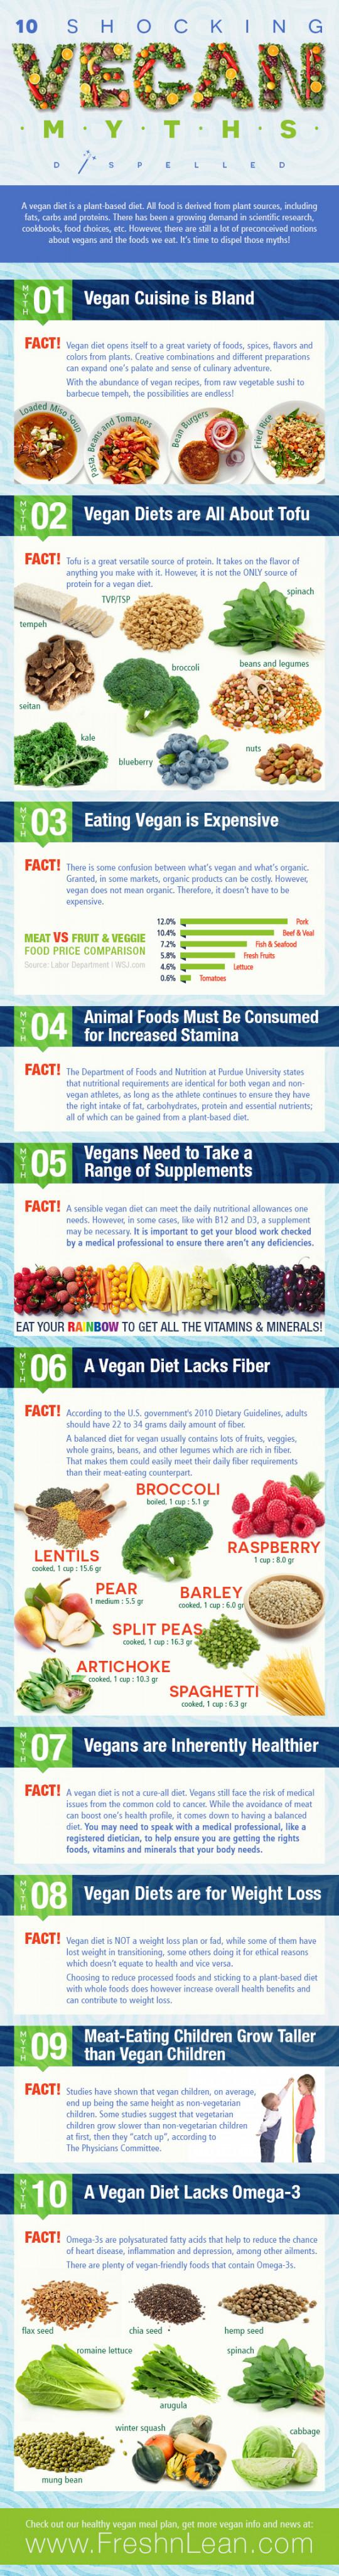 10 Shocking Vegan Myths Dispelled